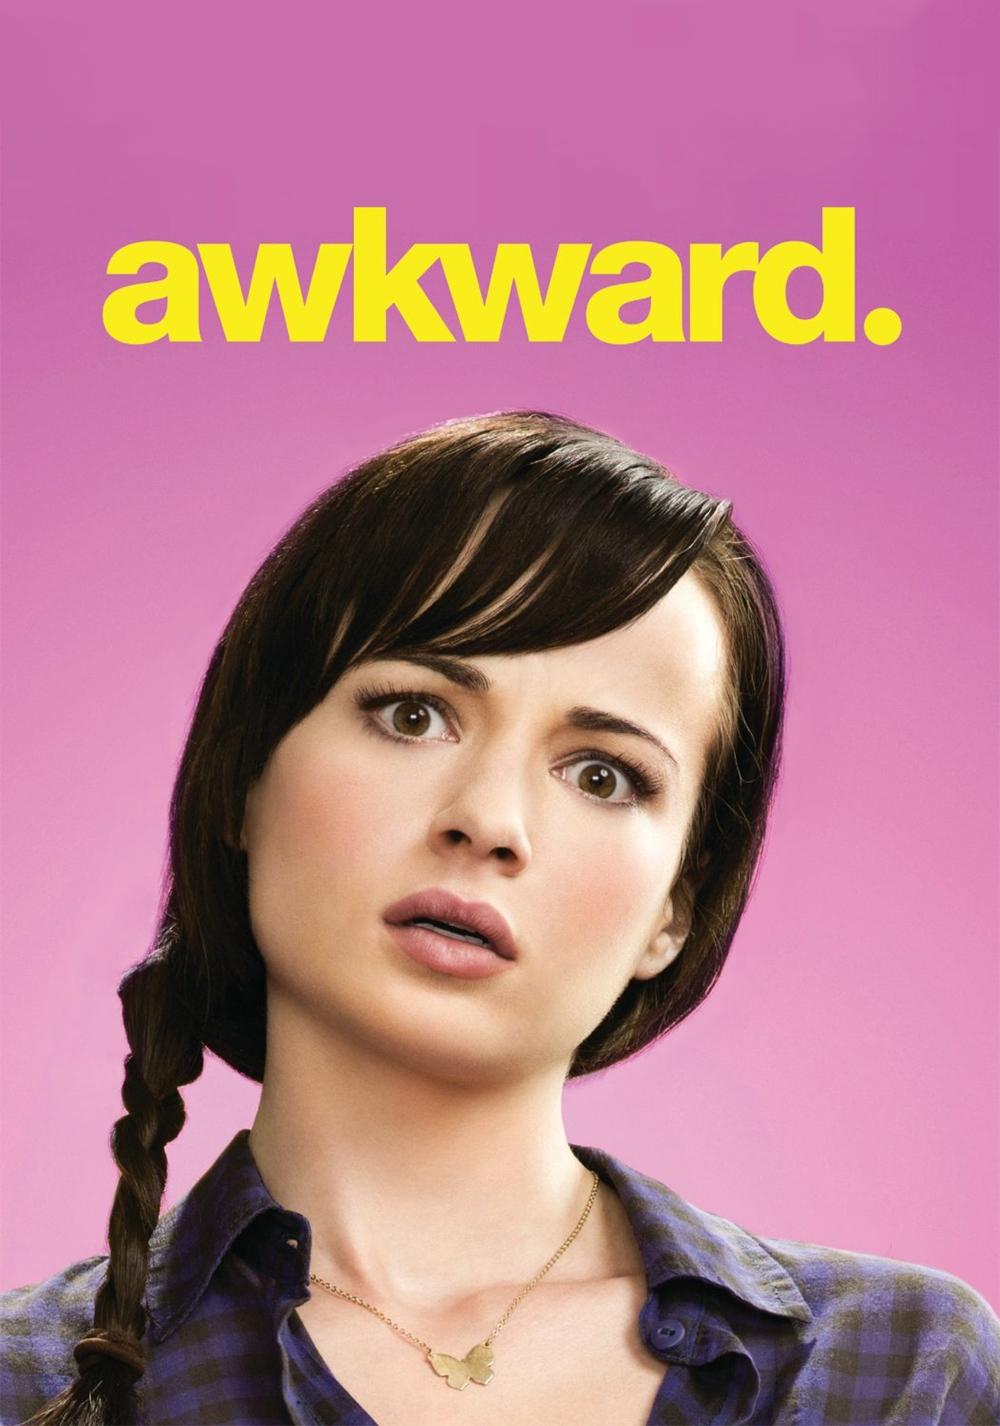 Awkward.S01E09.FRENCH.1080p.HDTV.H264-SH0W